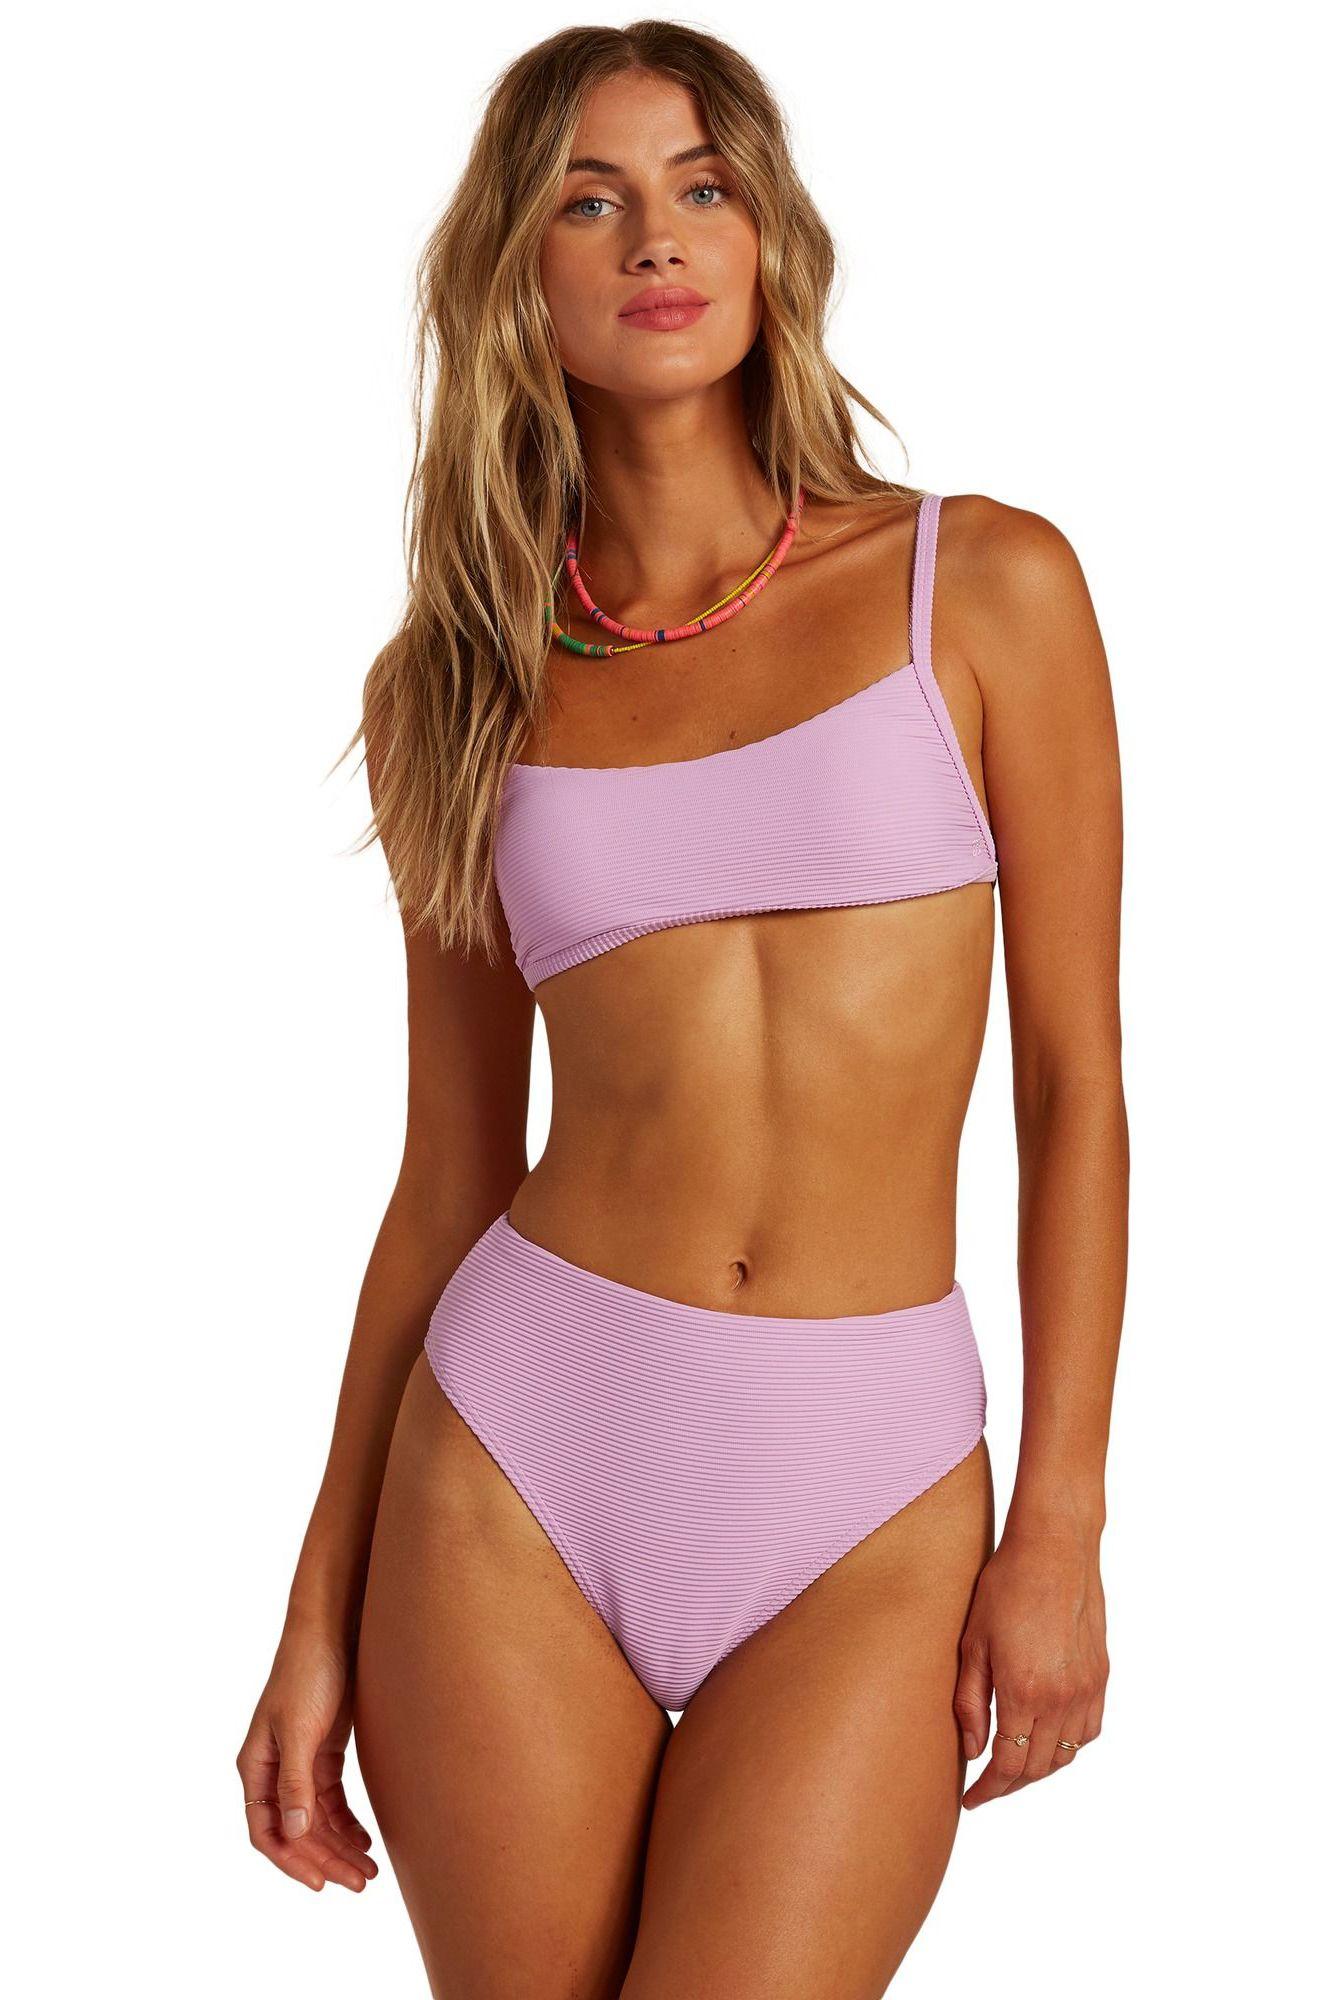 Bikini Top Billabong TANLINES BRALETTE PIPE MASTER Lit Up Lilac